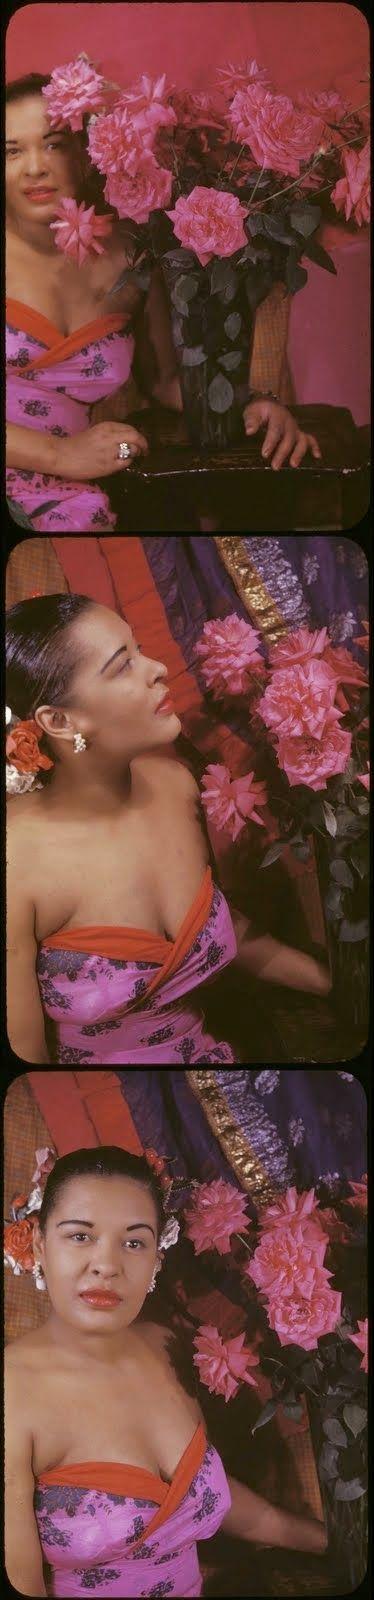 VINTAGE BLOG: Billie Holiday by Carl Van Vechten 1949